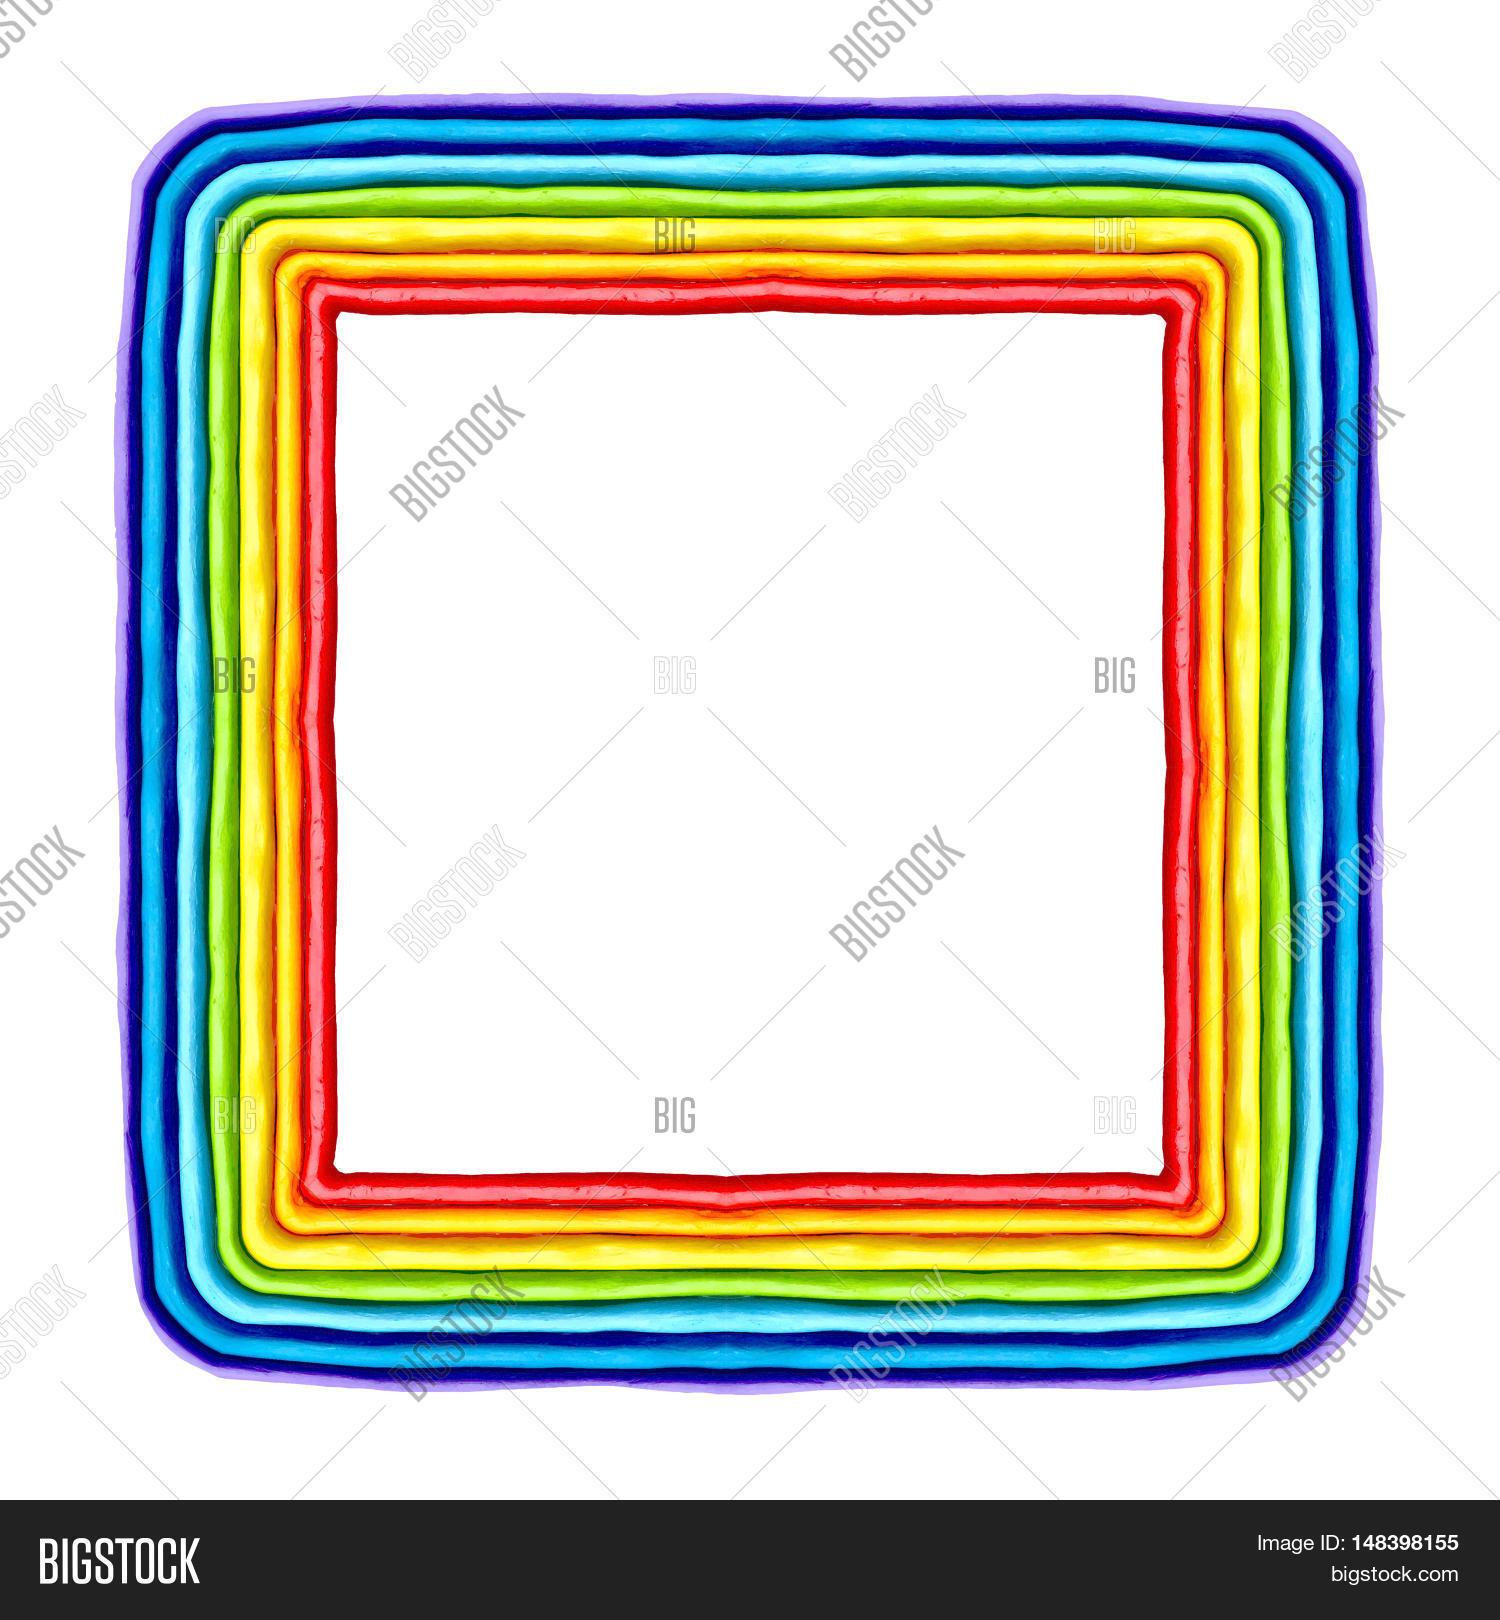 Rainbow, Frame, Border Image & Photo (Free Trial) | Bigstock